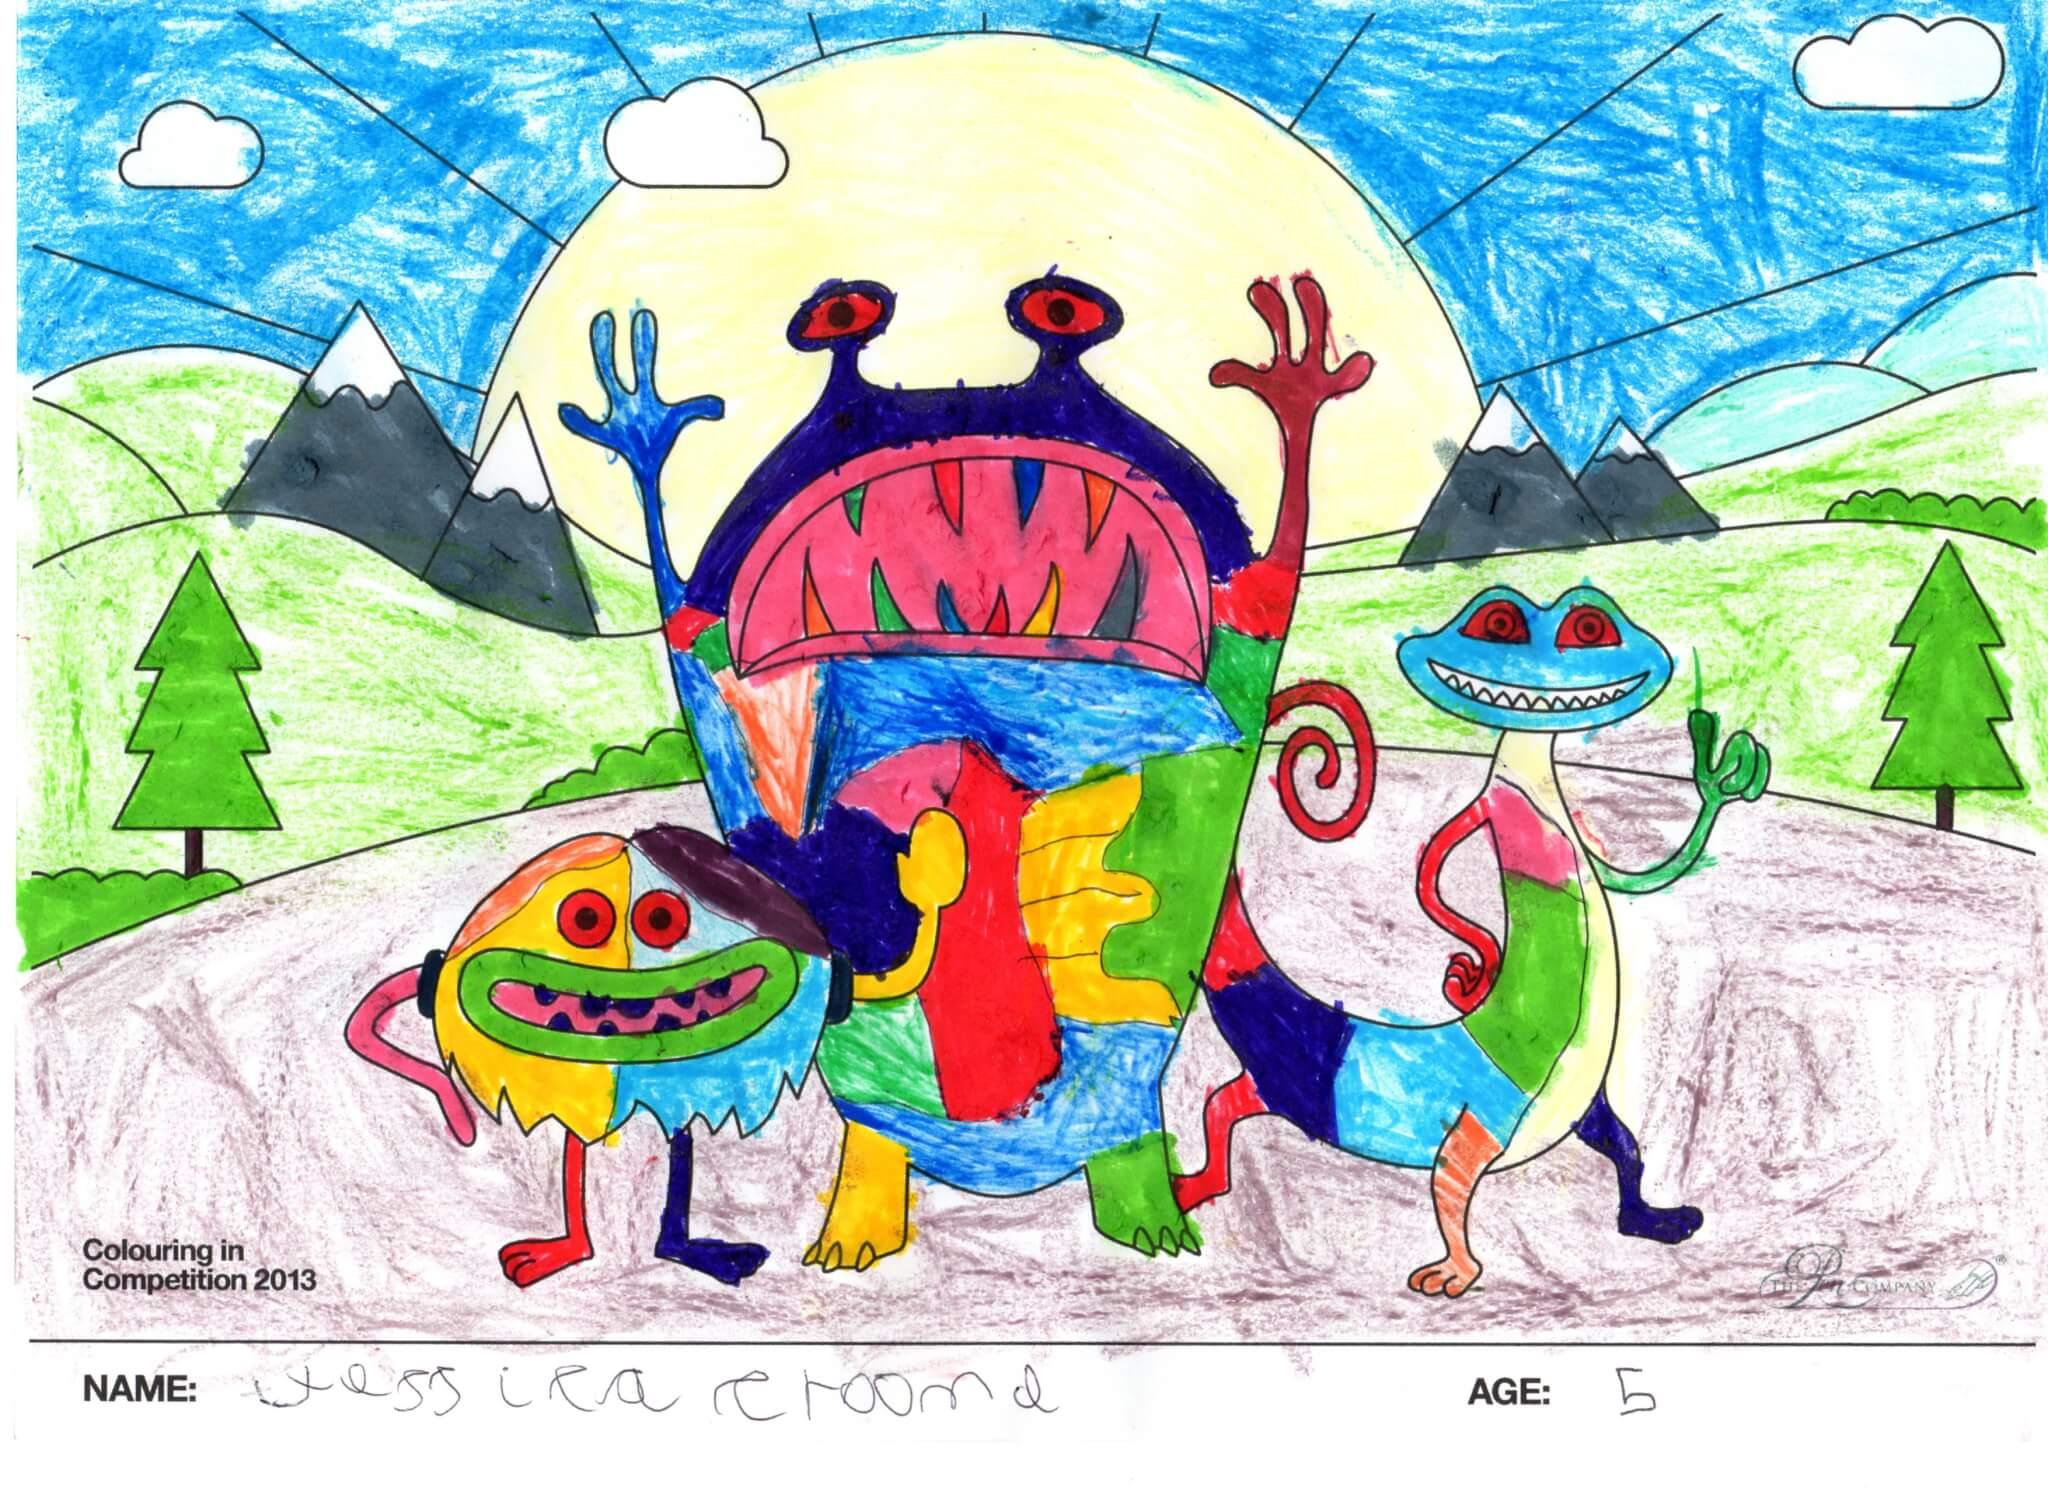 jessica-croome-age-5